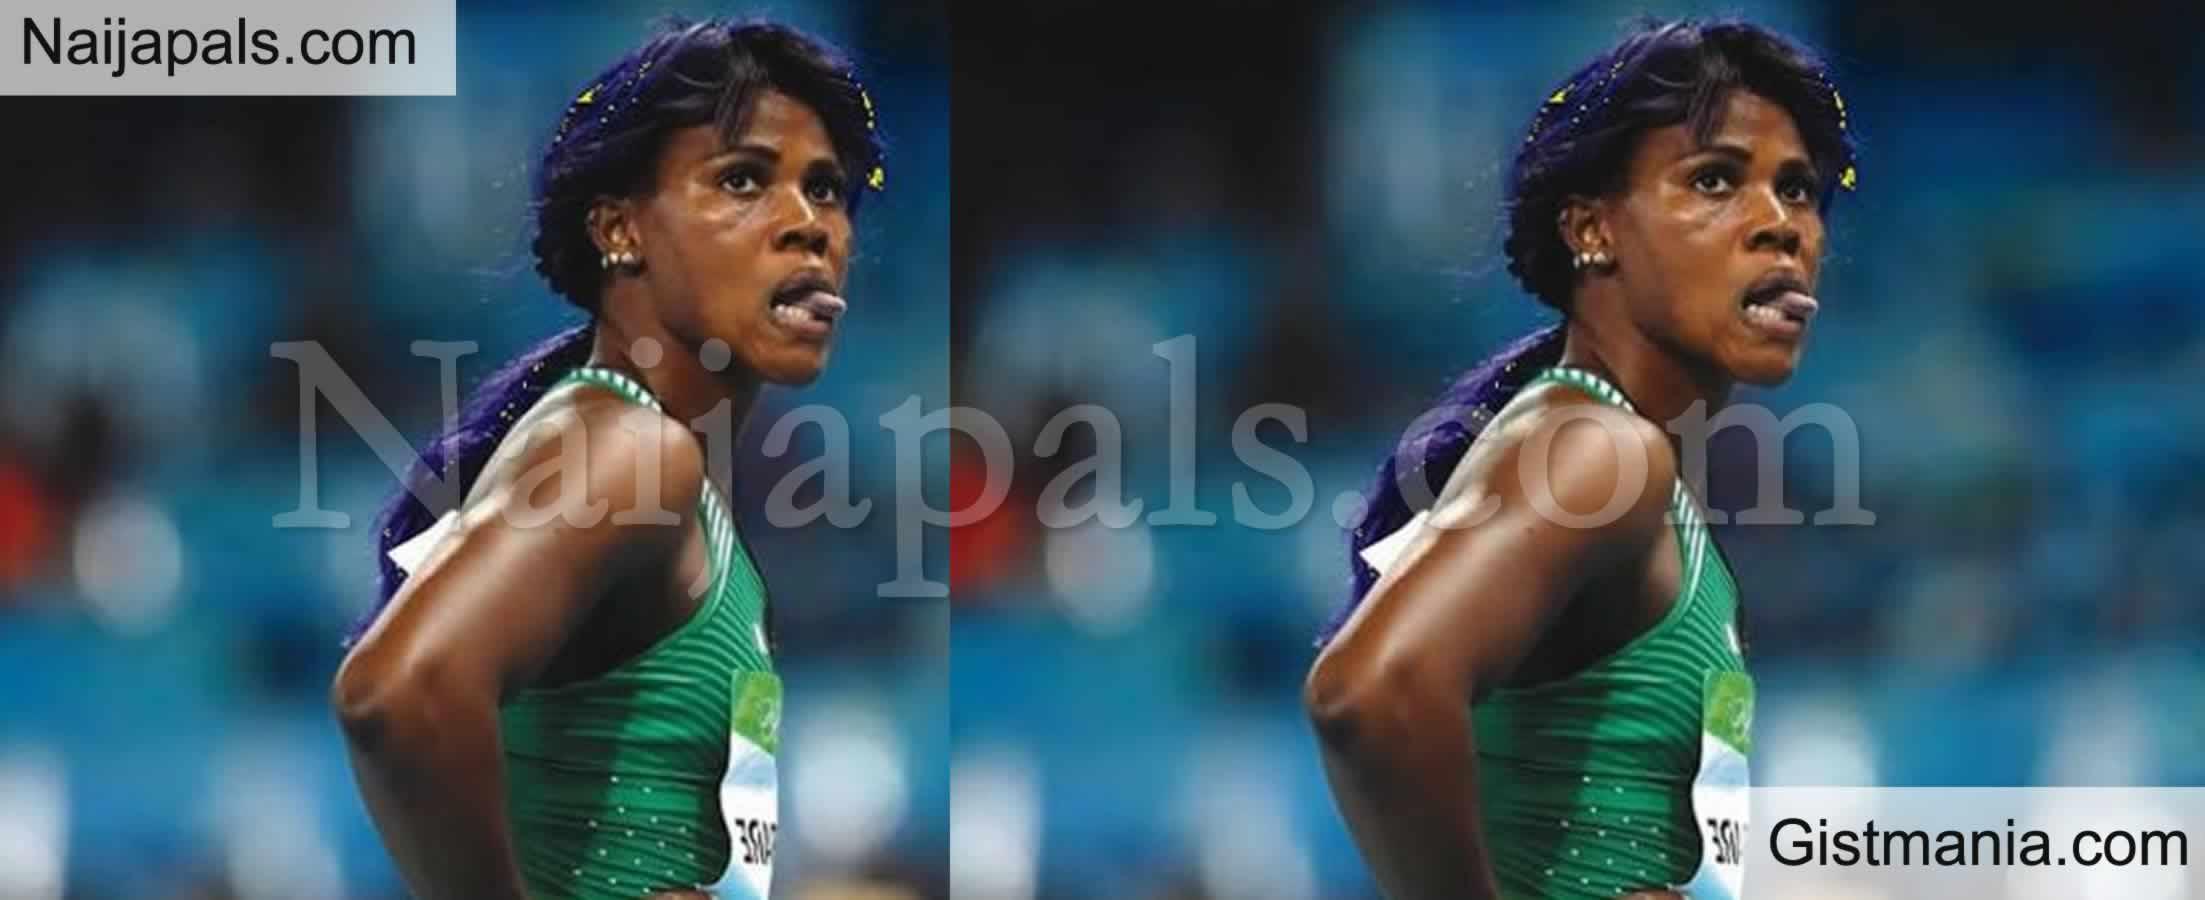 <img alt='.' class='lazyload' data-src='https://img.gistmania.com/emot/news.gif' /> #Tokyo2020: <b>Nigeria Athletes, Okagbare & Nwokocha Book Semi Final Spots in Women's 100 Meters</b>